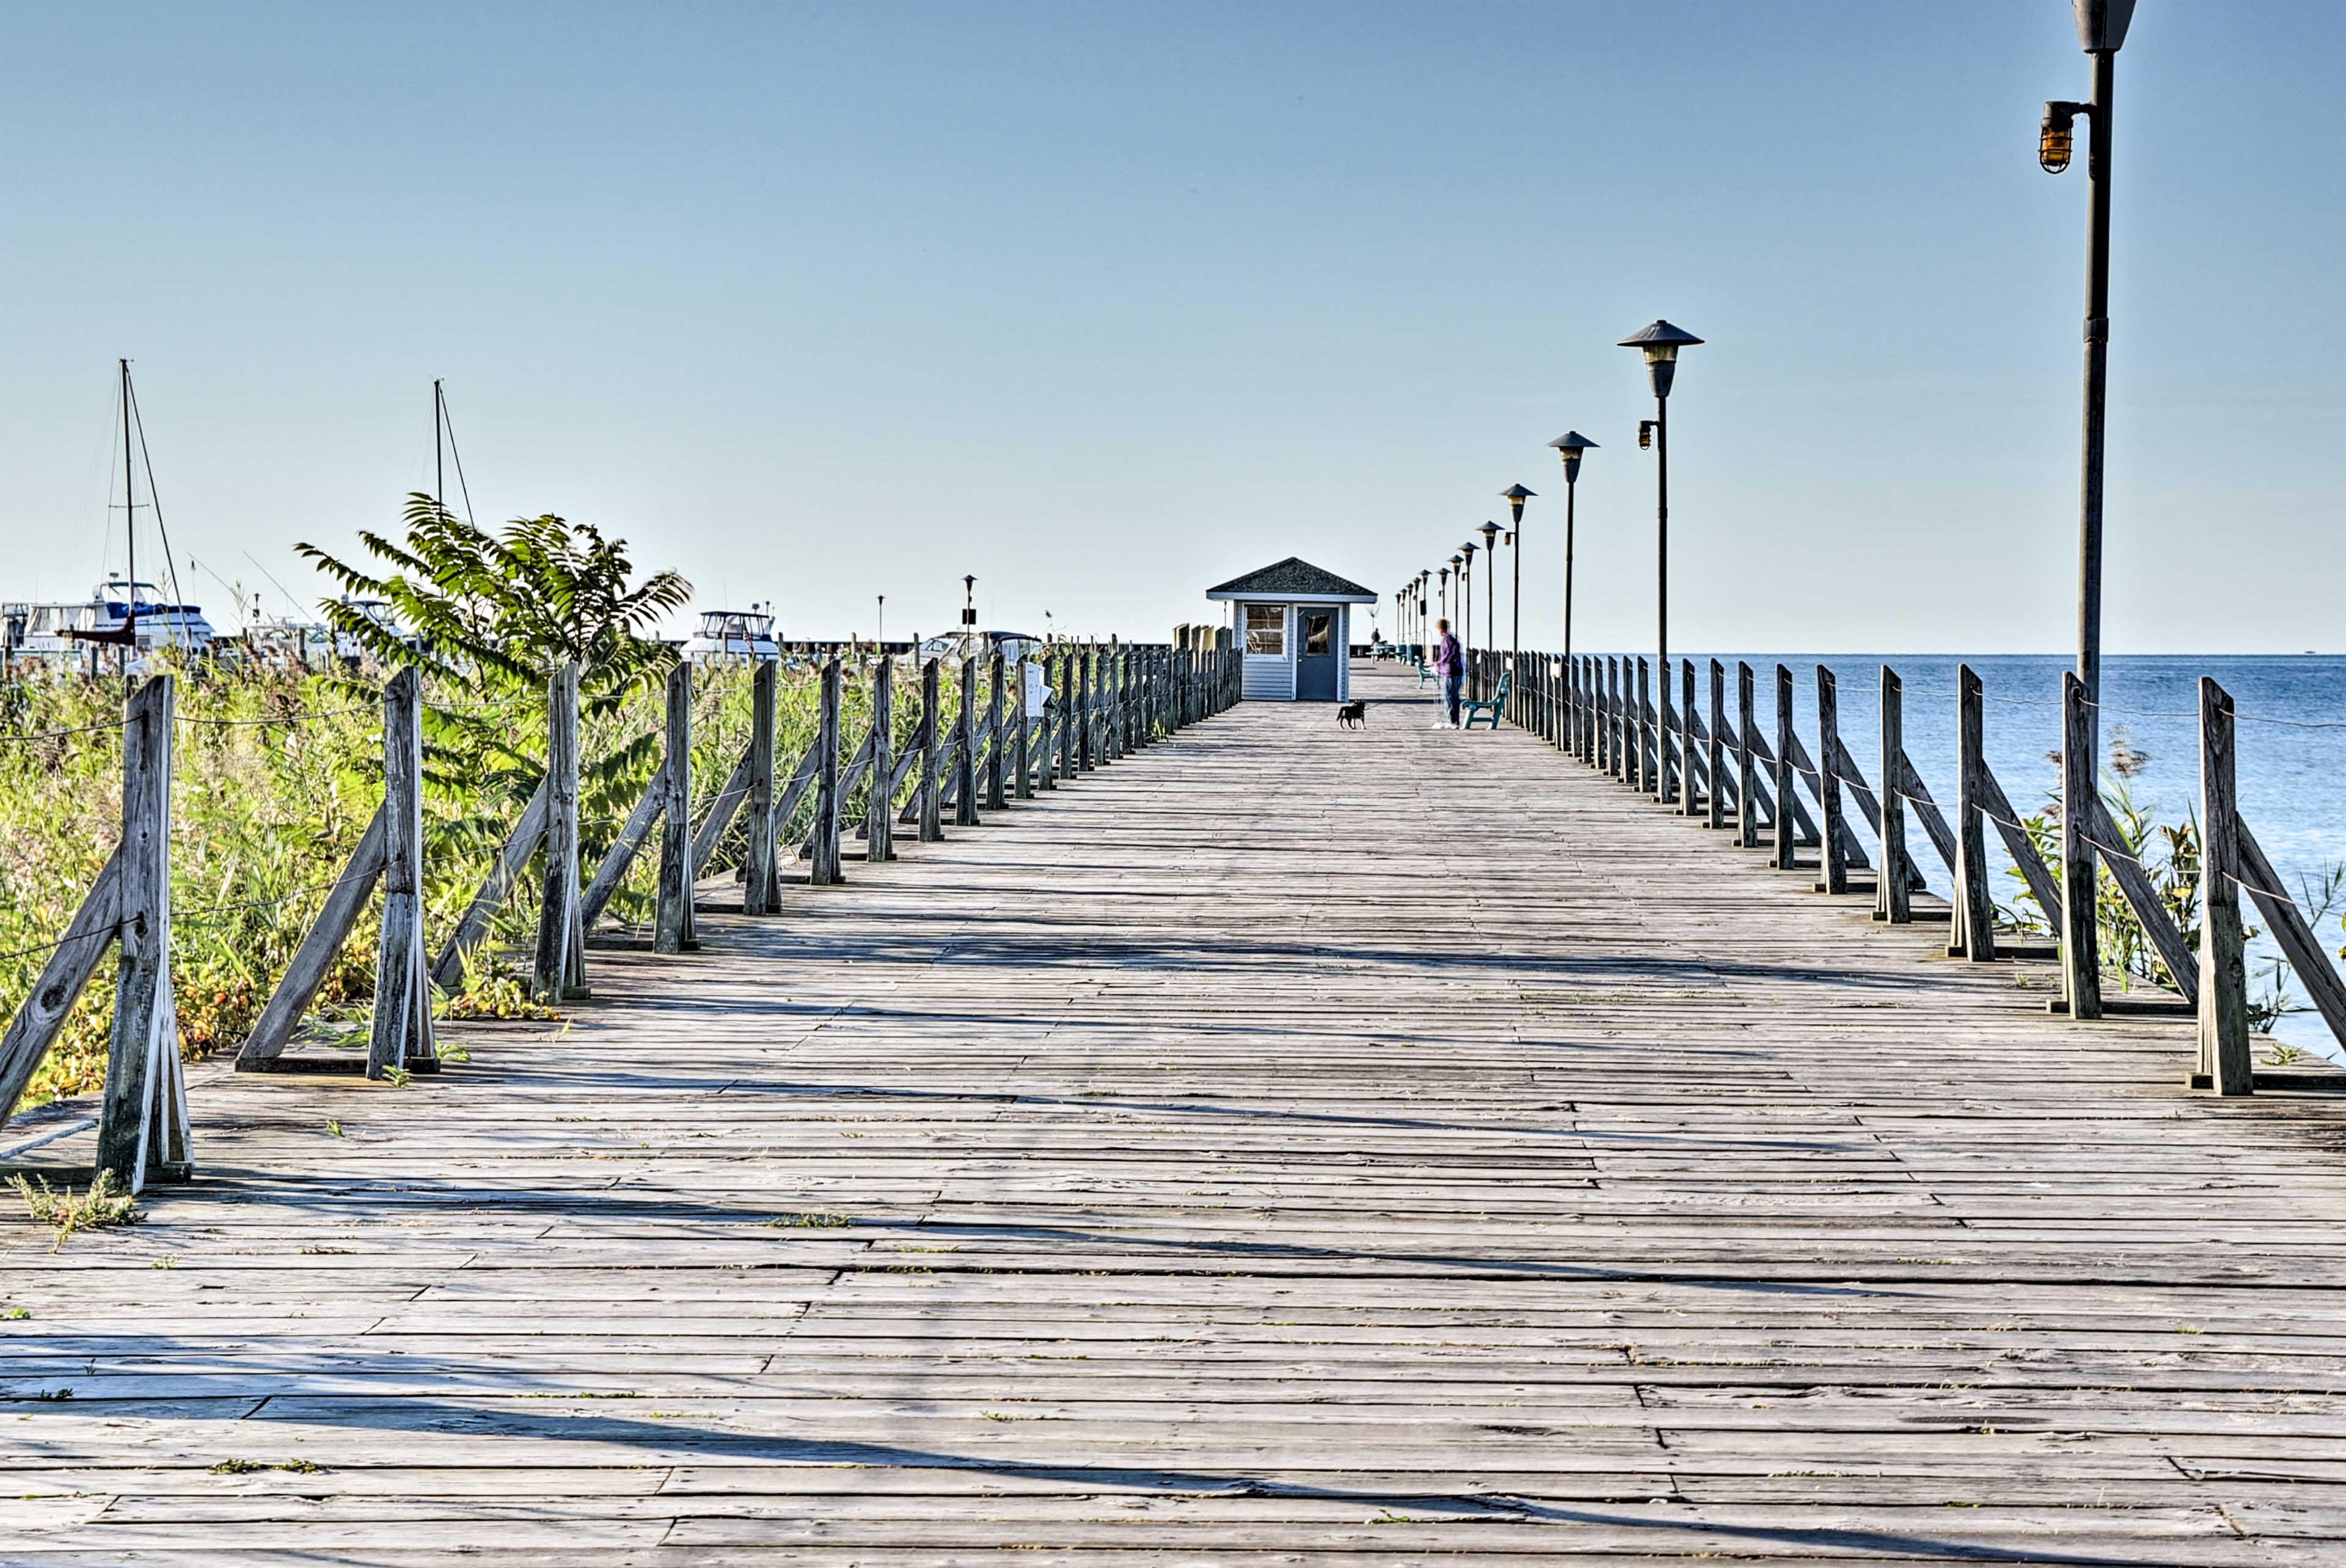 Across the Street | Pier